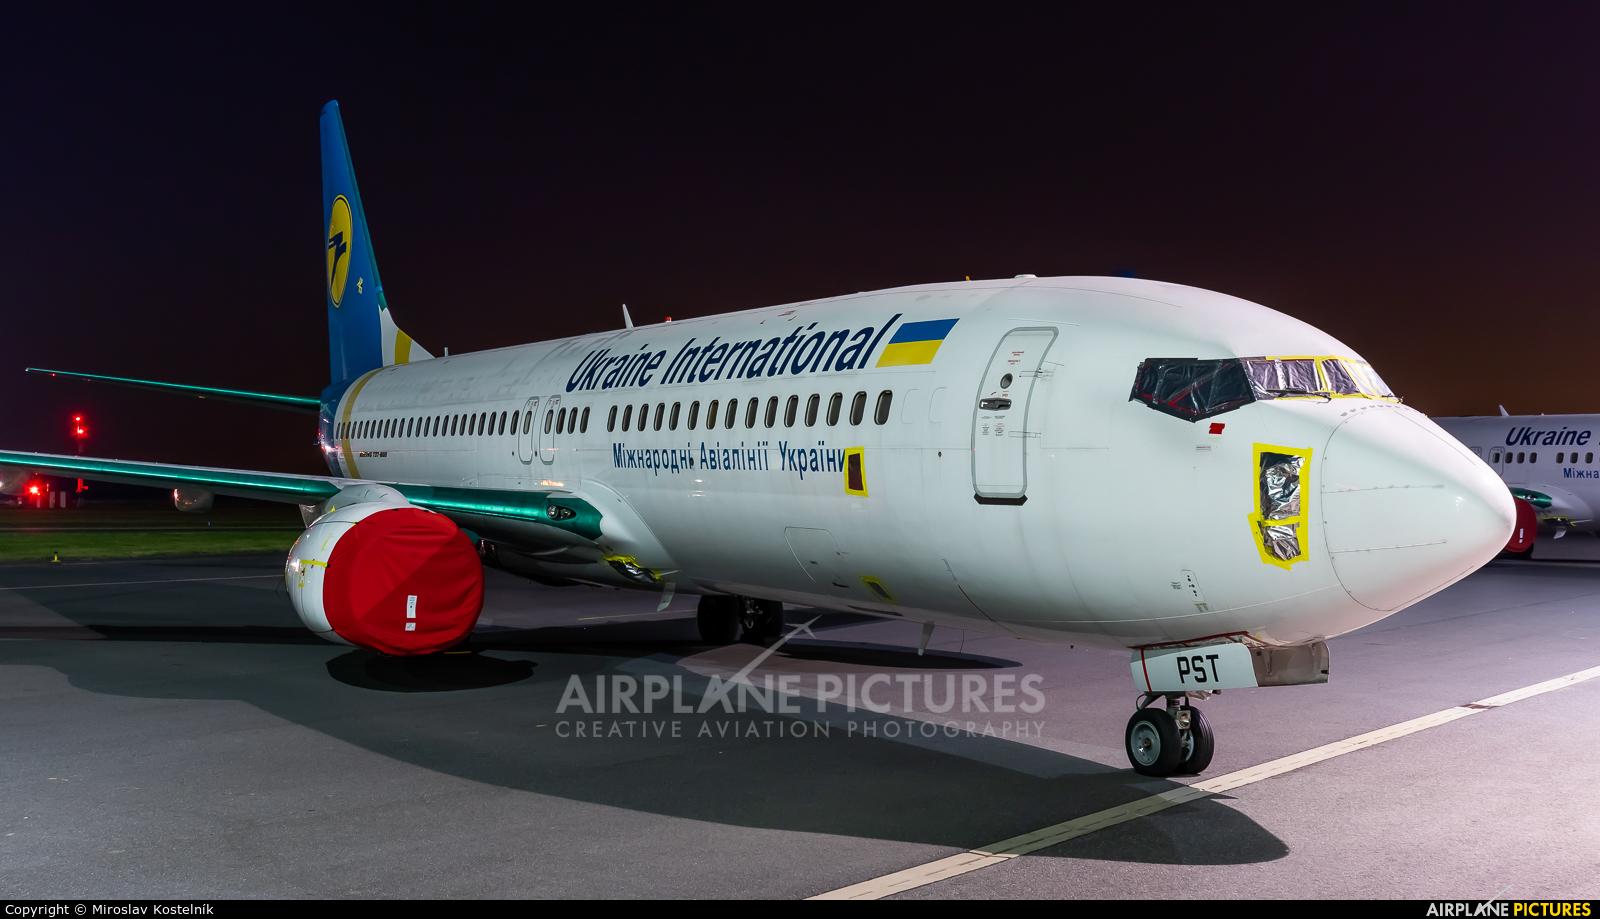 Ukraine International Airlines UR-PST aircraft at Ostrava Mošnov